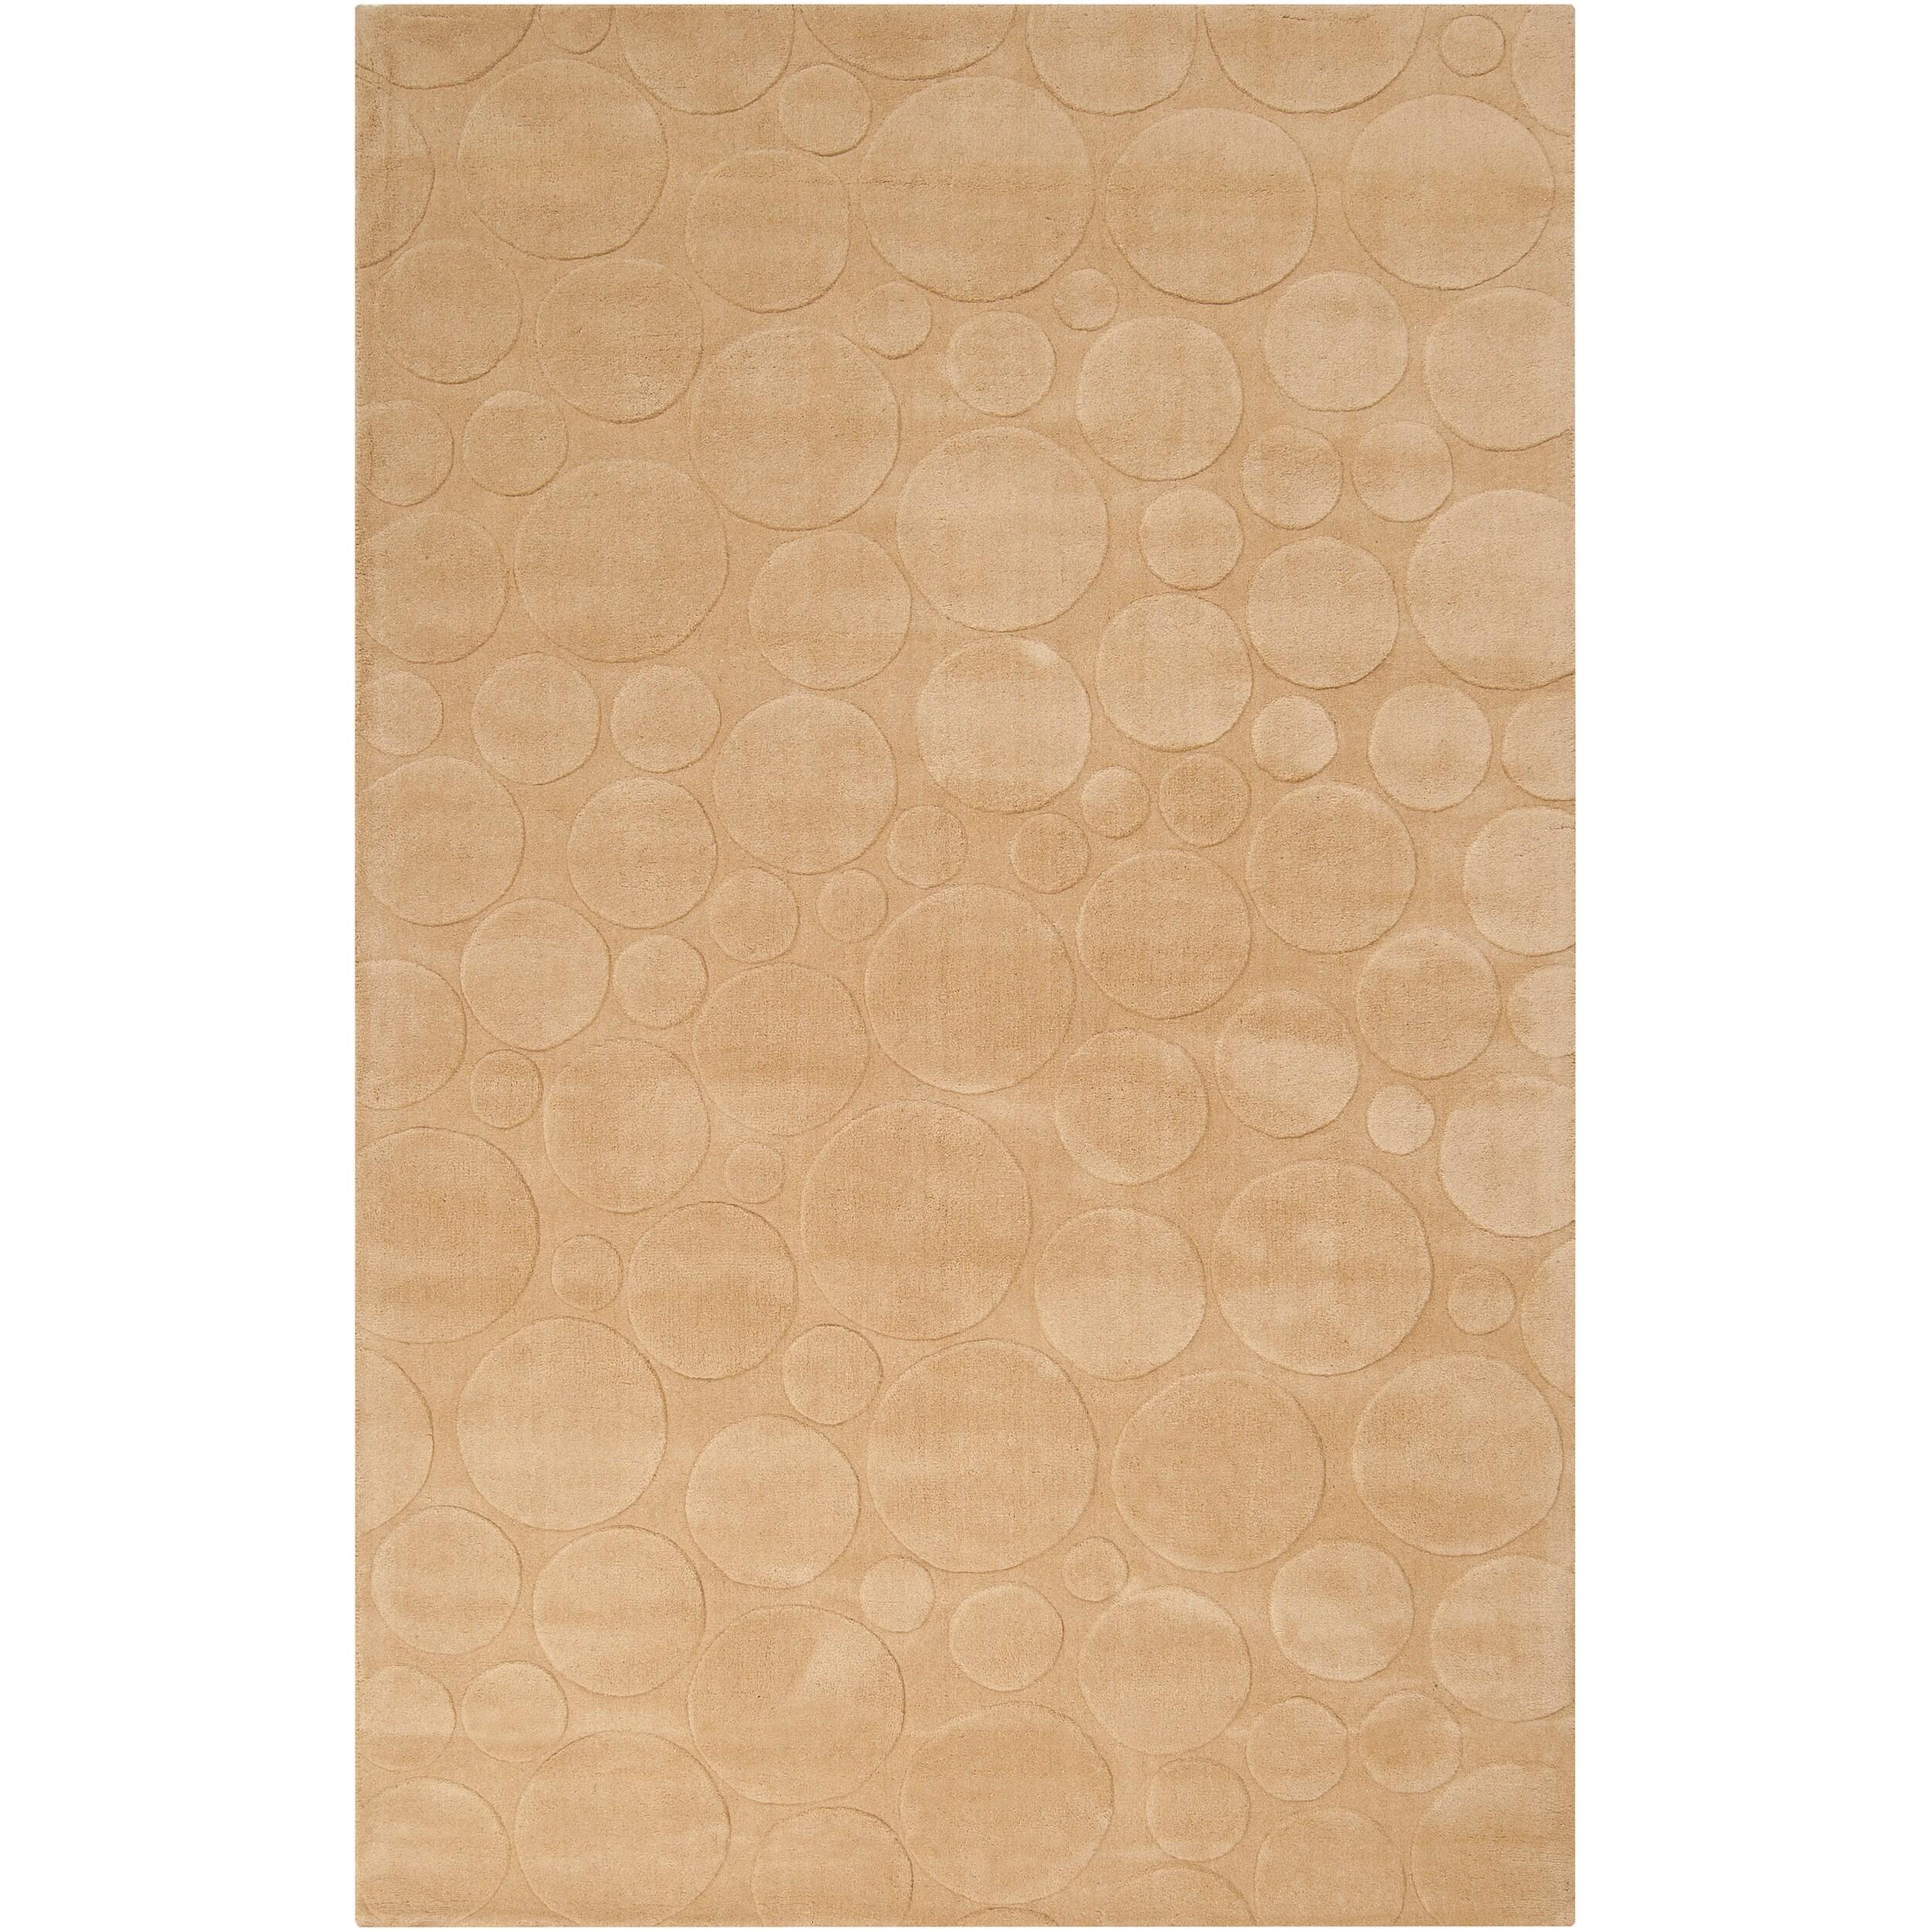 Candice Olson Loomed Tan Scrumptious Geometric Circles Indoor Wool Rug (5' x 8')